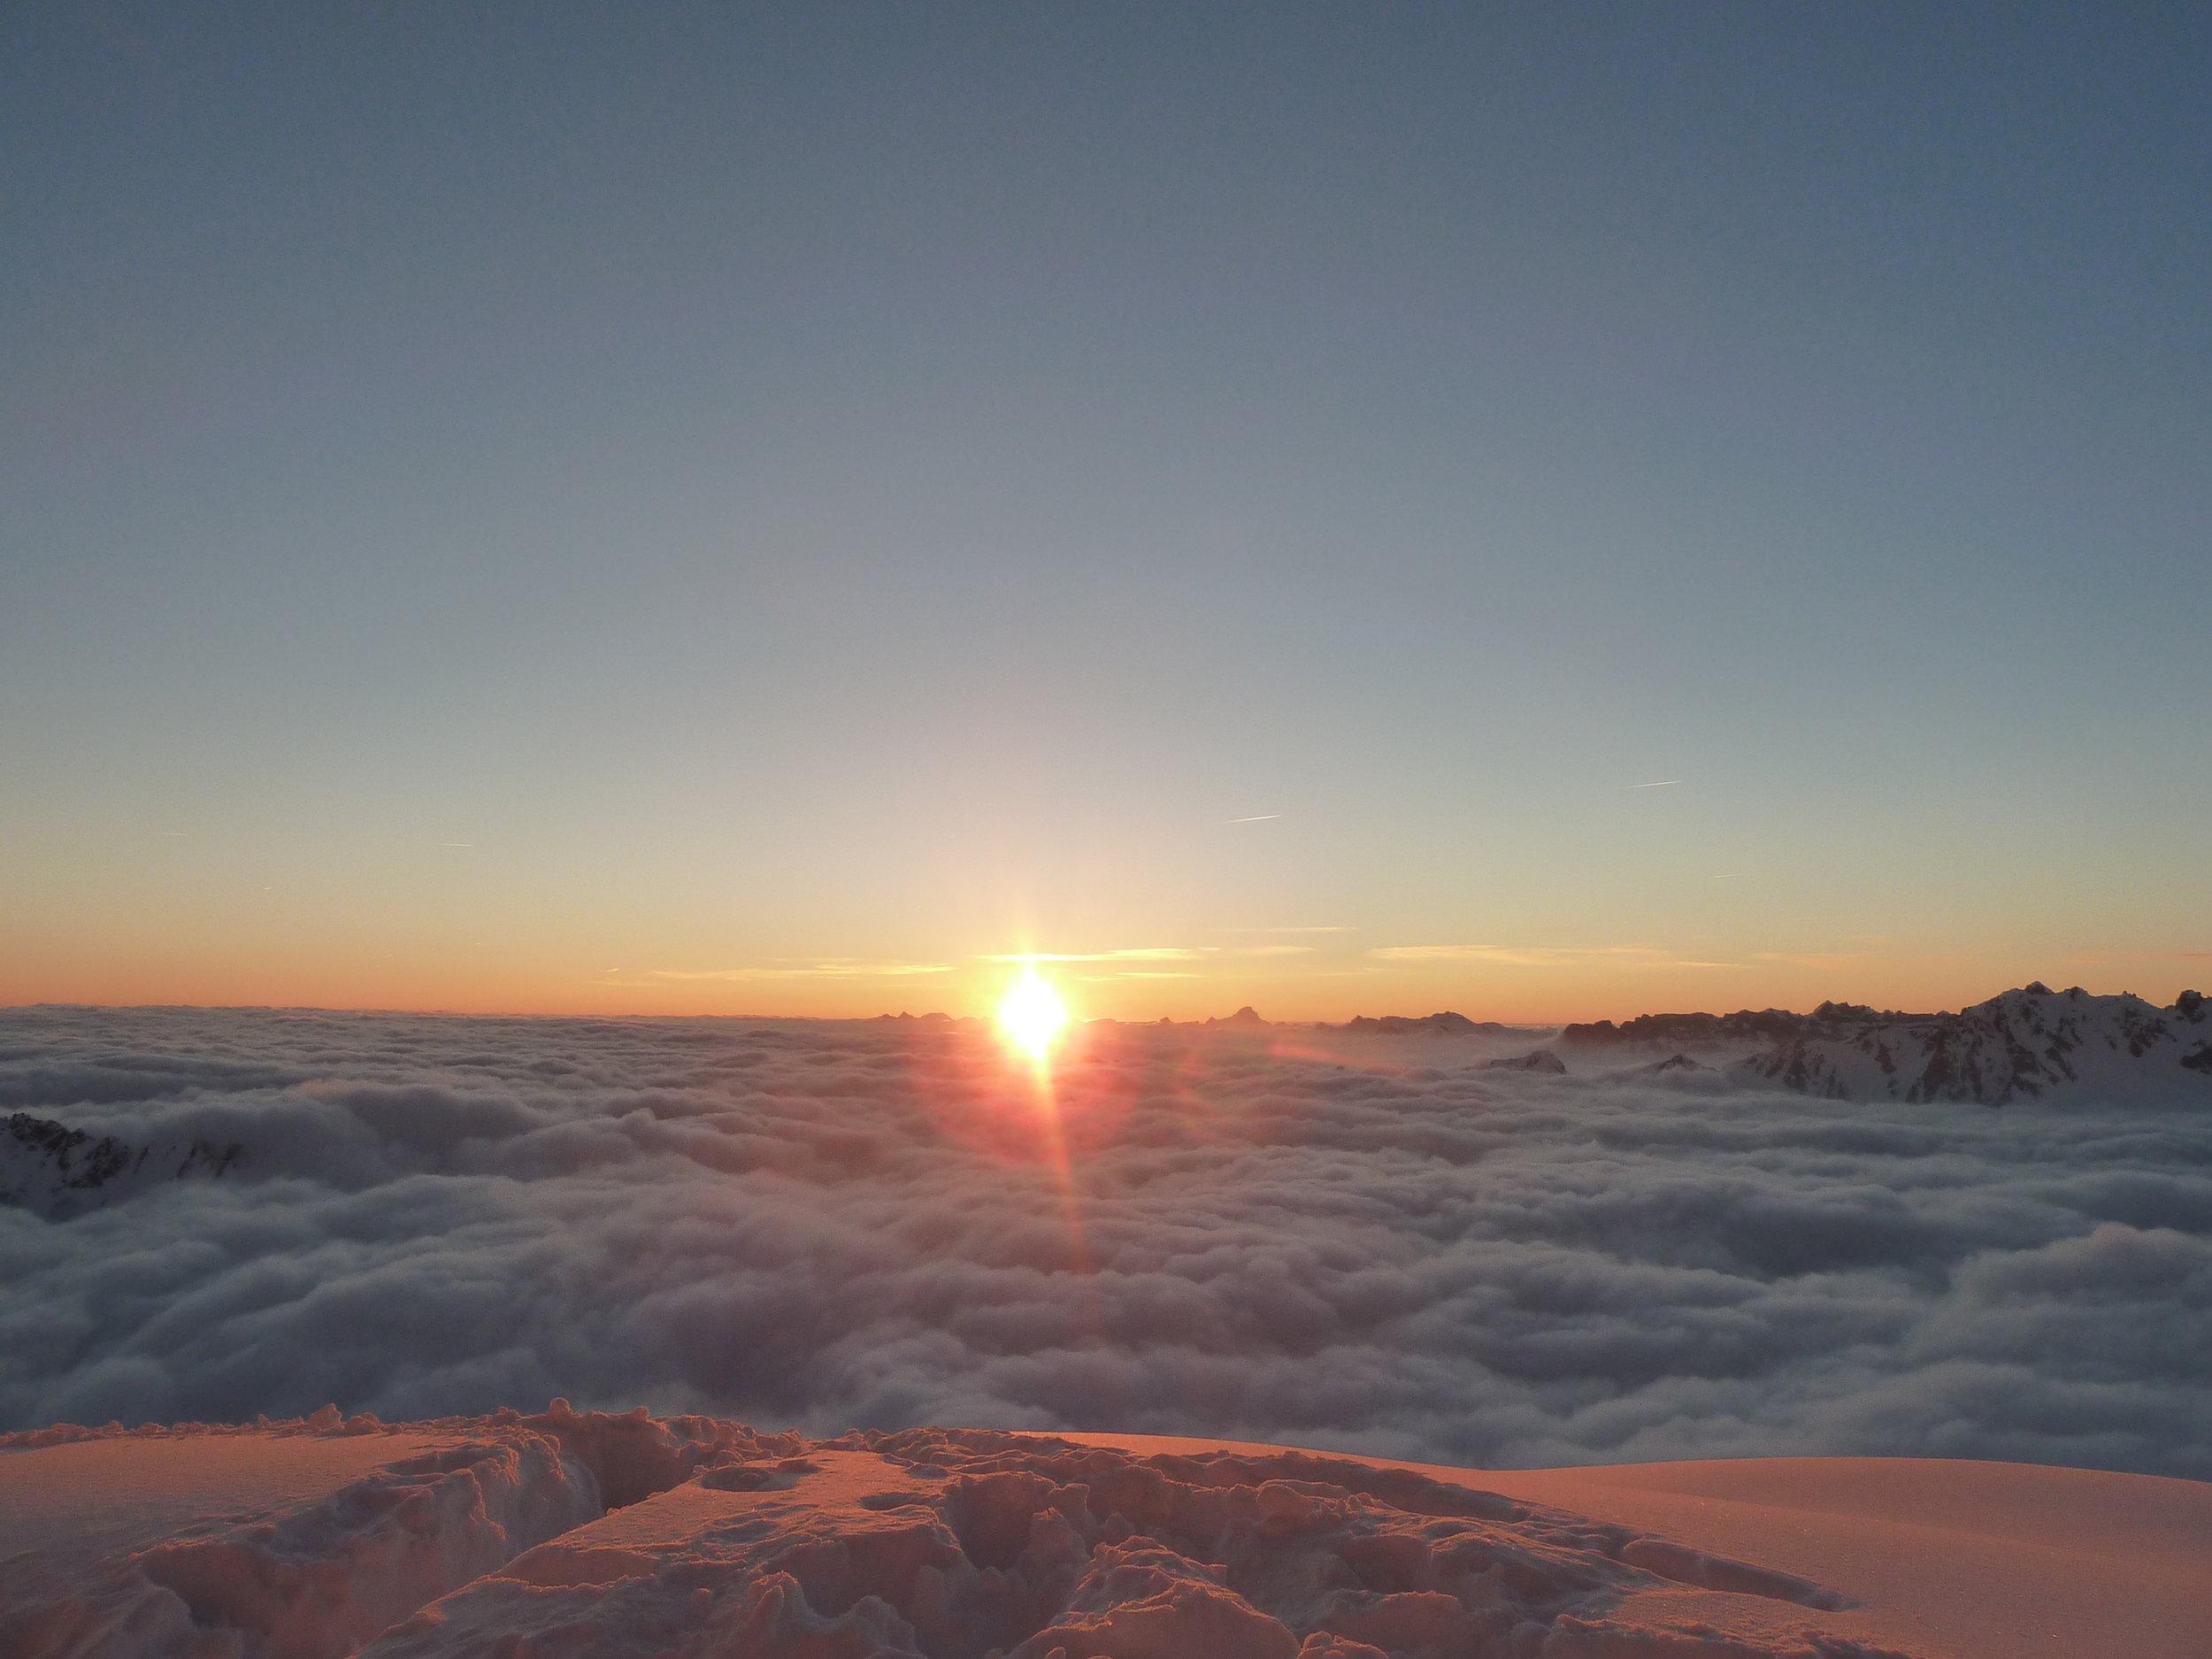 sunset from the mont blanc massif. chamonix.